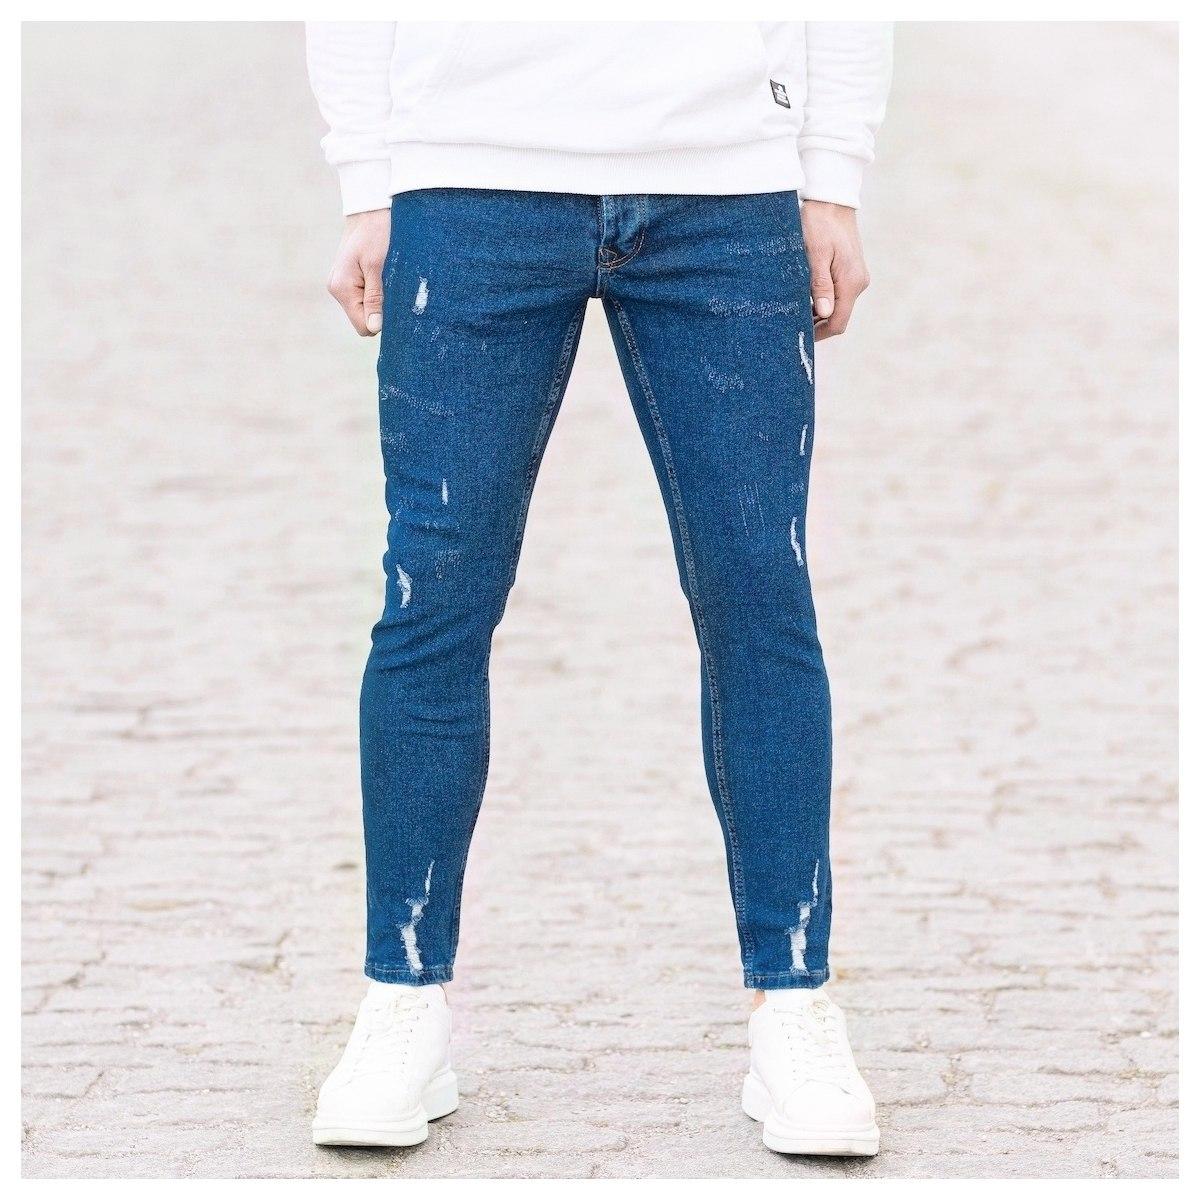 Men's Distorted Jeans In Navy Blue